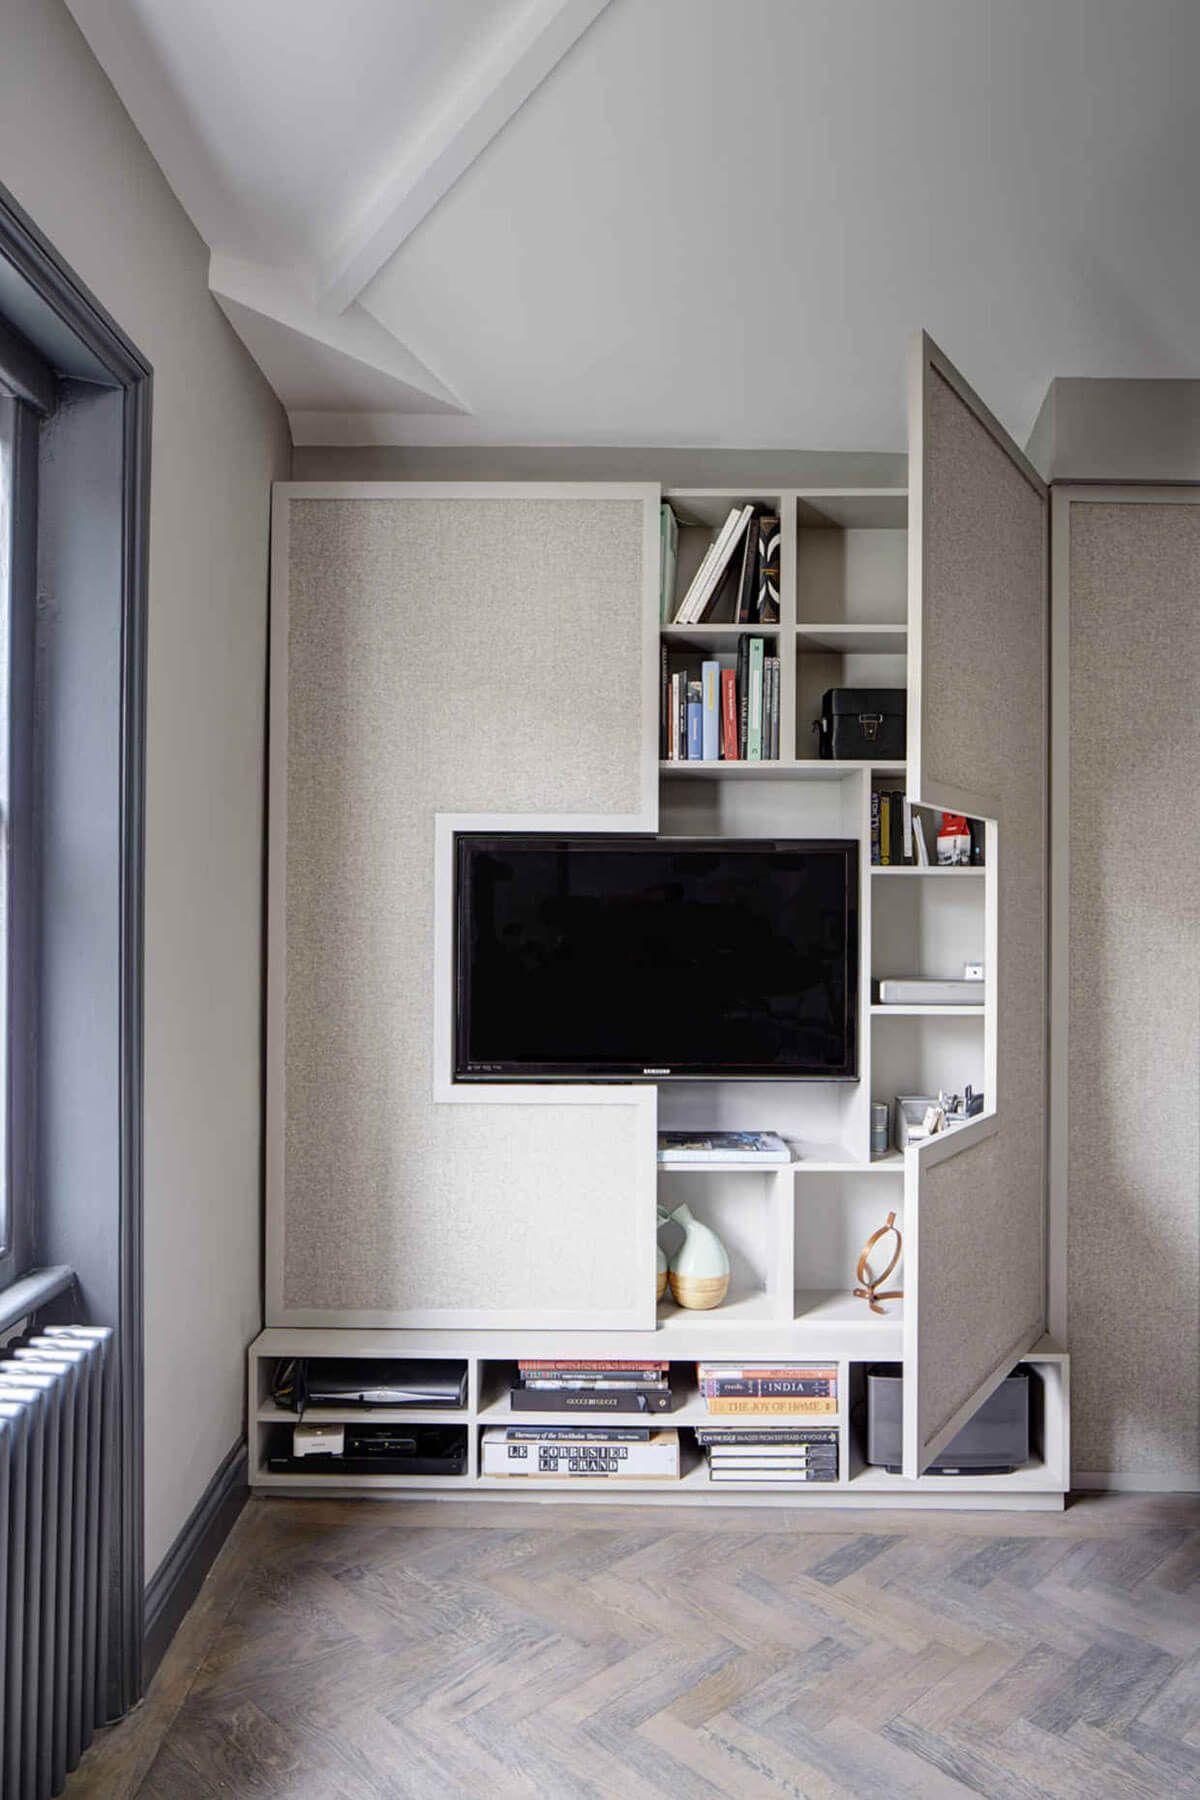 Interior Design Fai Da Te 25+ fabulous built-in storage ideas to maximize your living